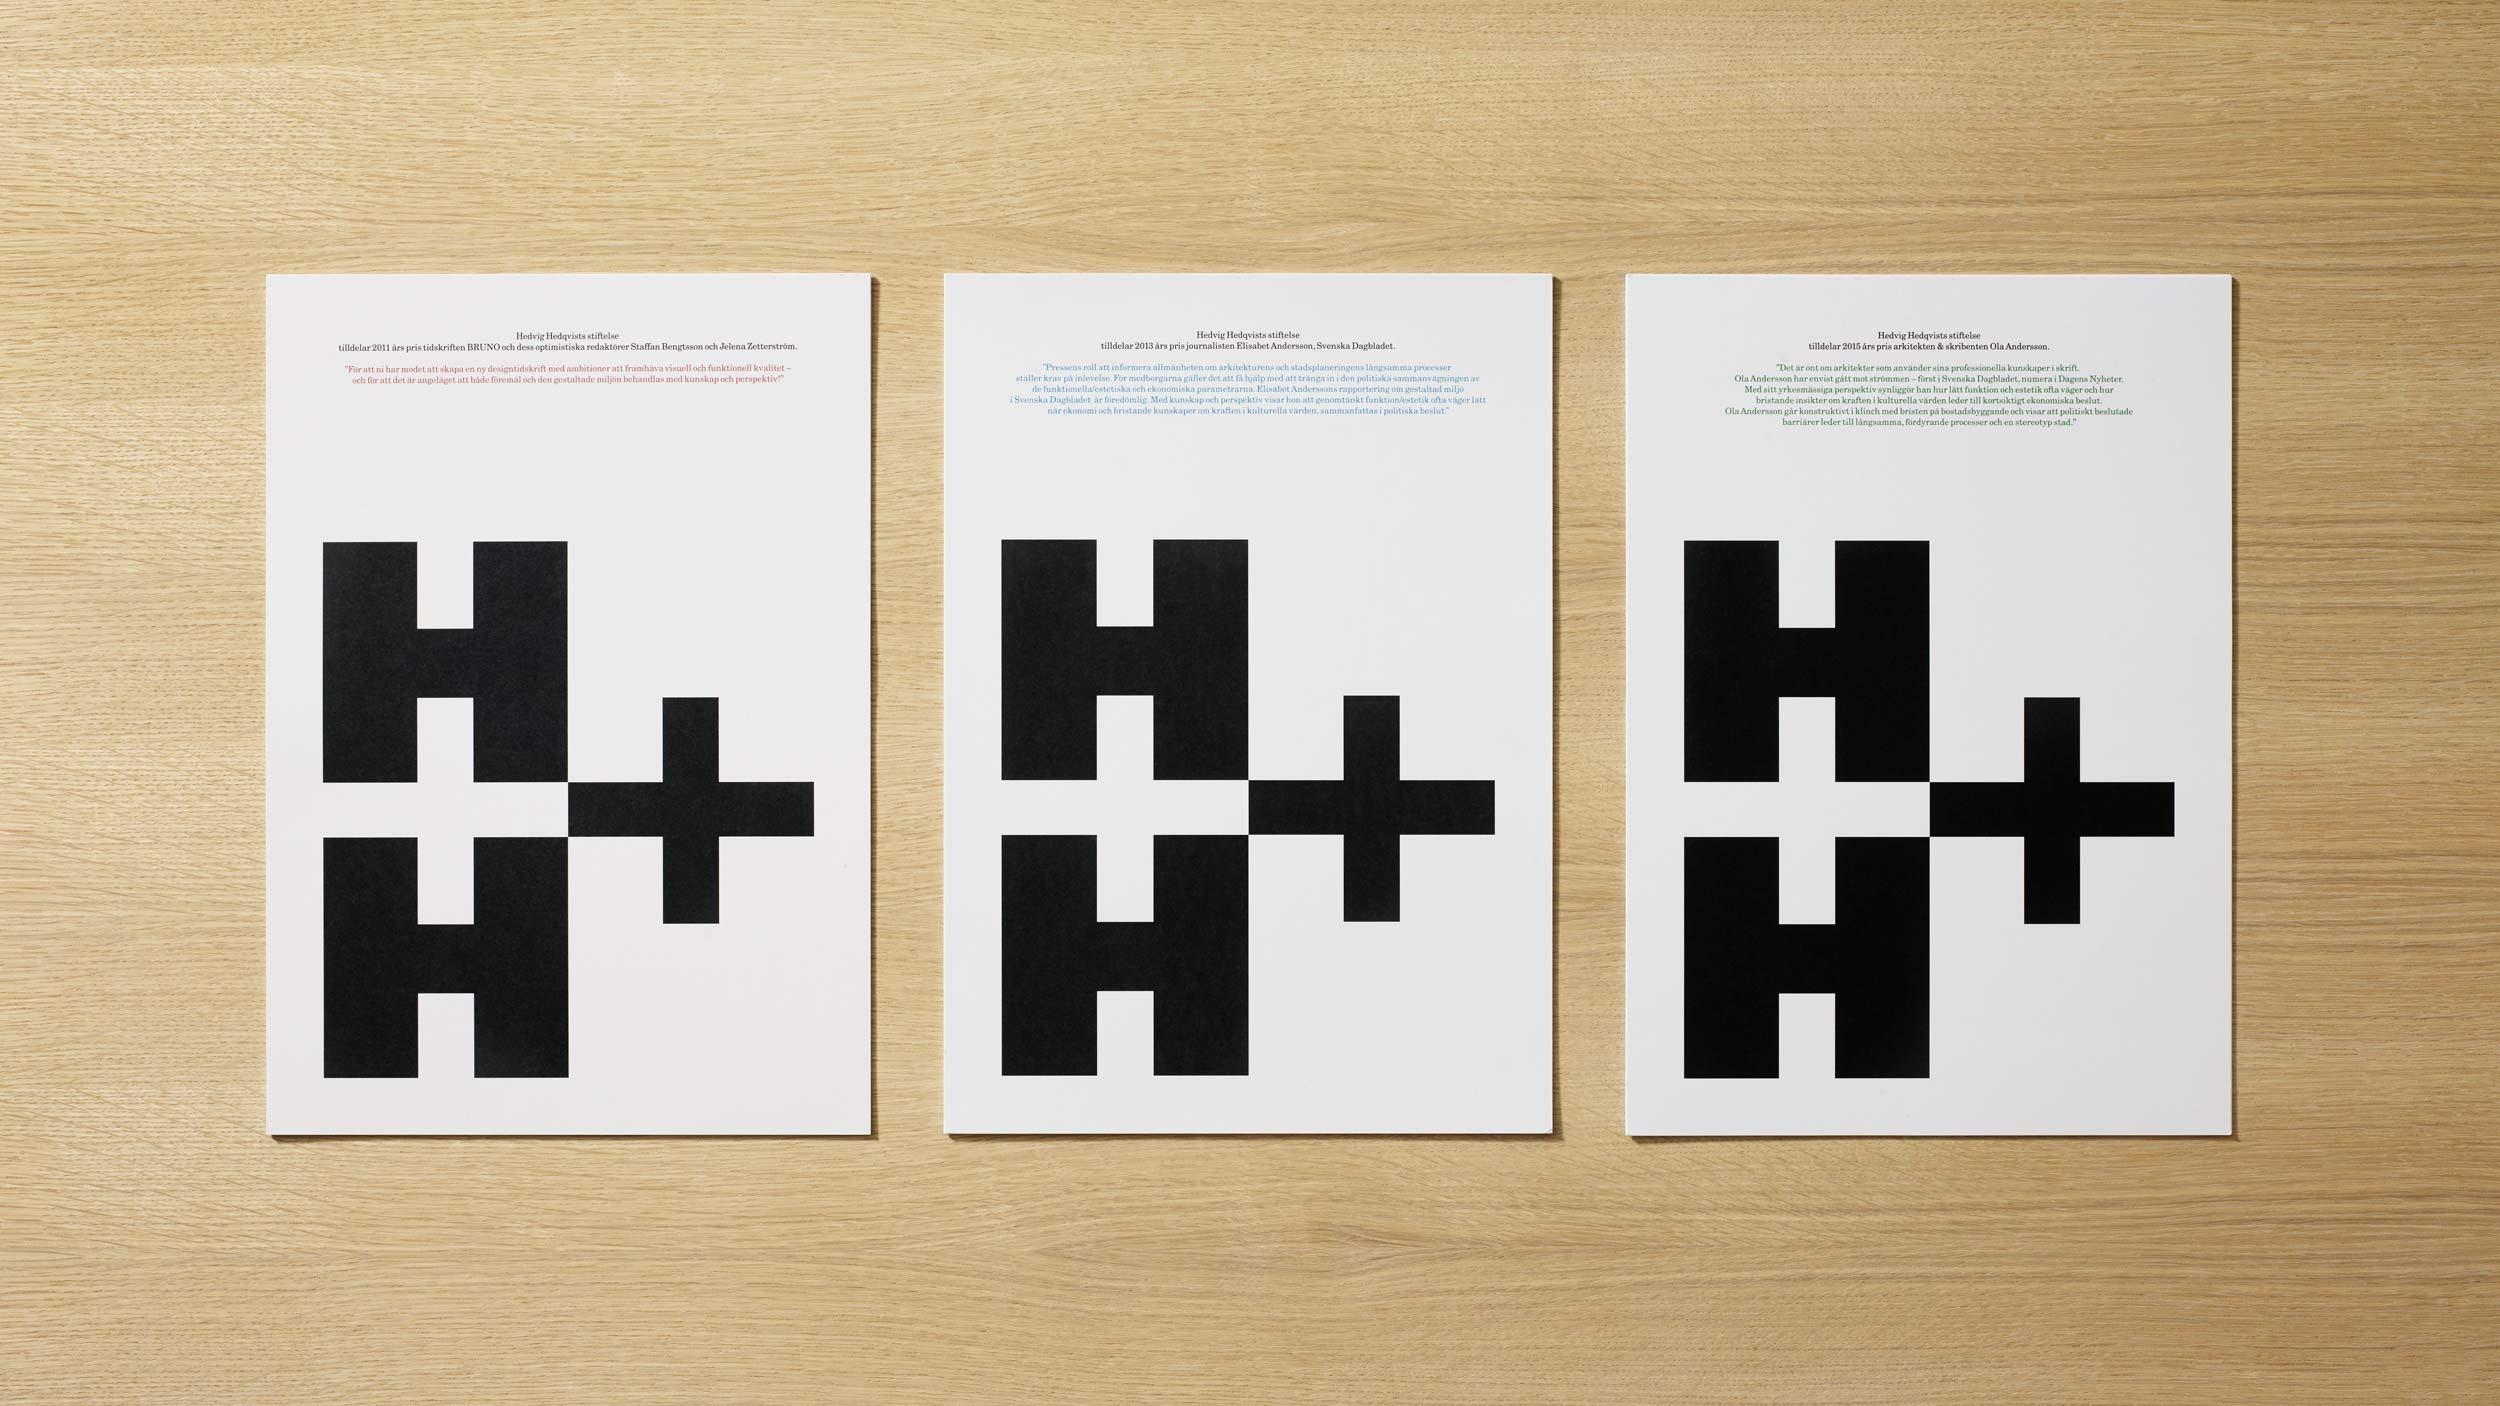 Hedvig Hedqvist Foundation – identity